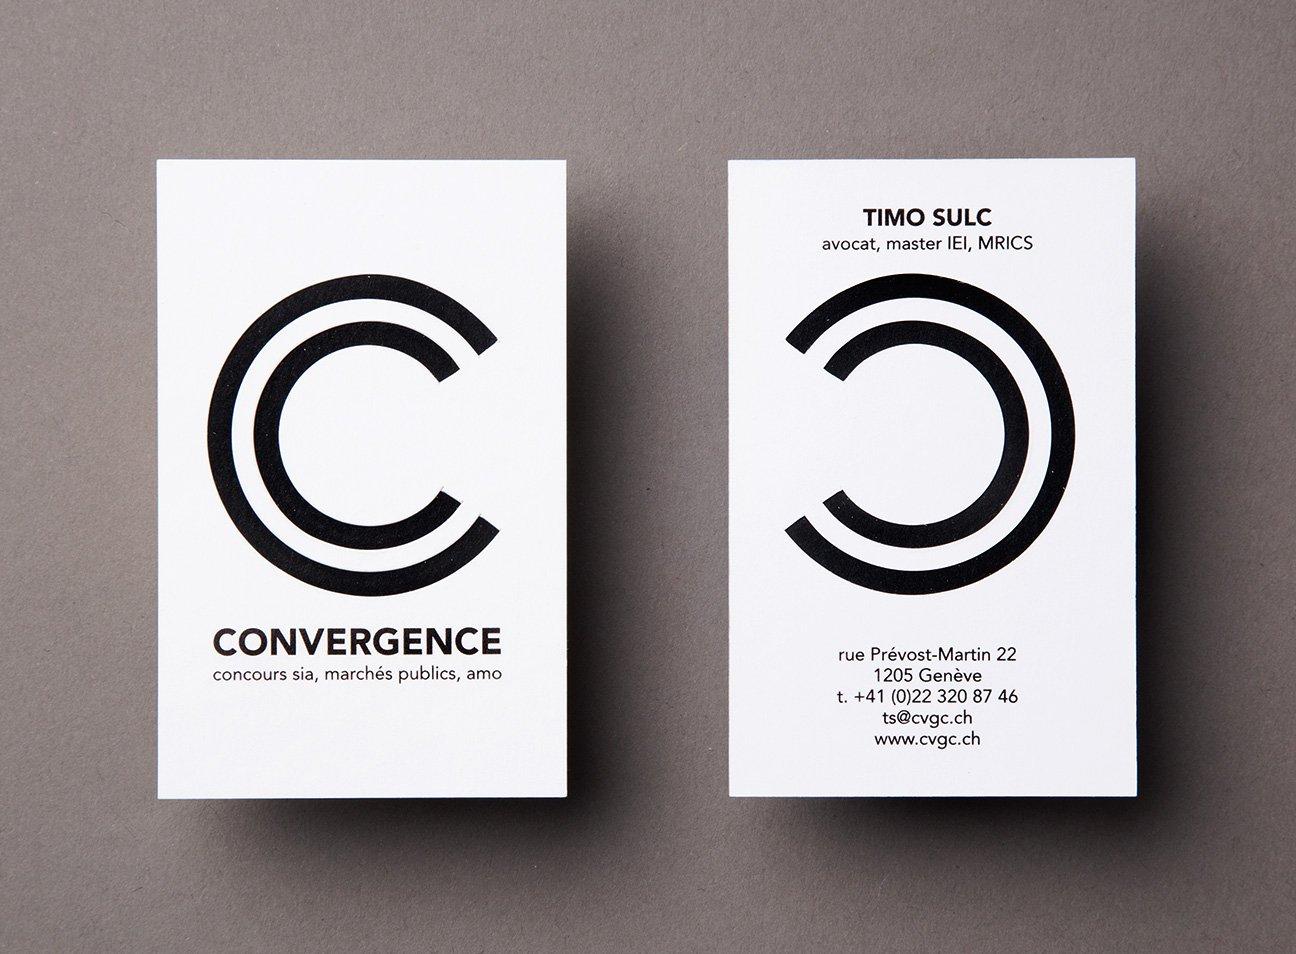 Convergence_geneve_suisse